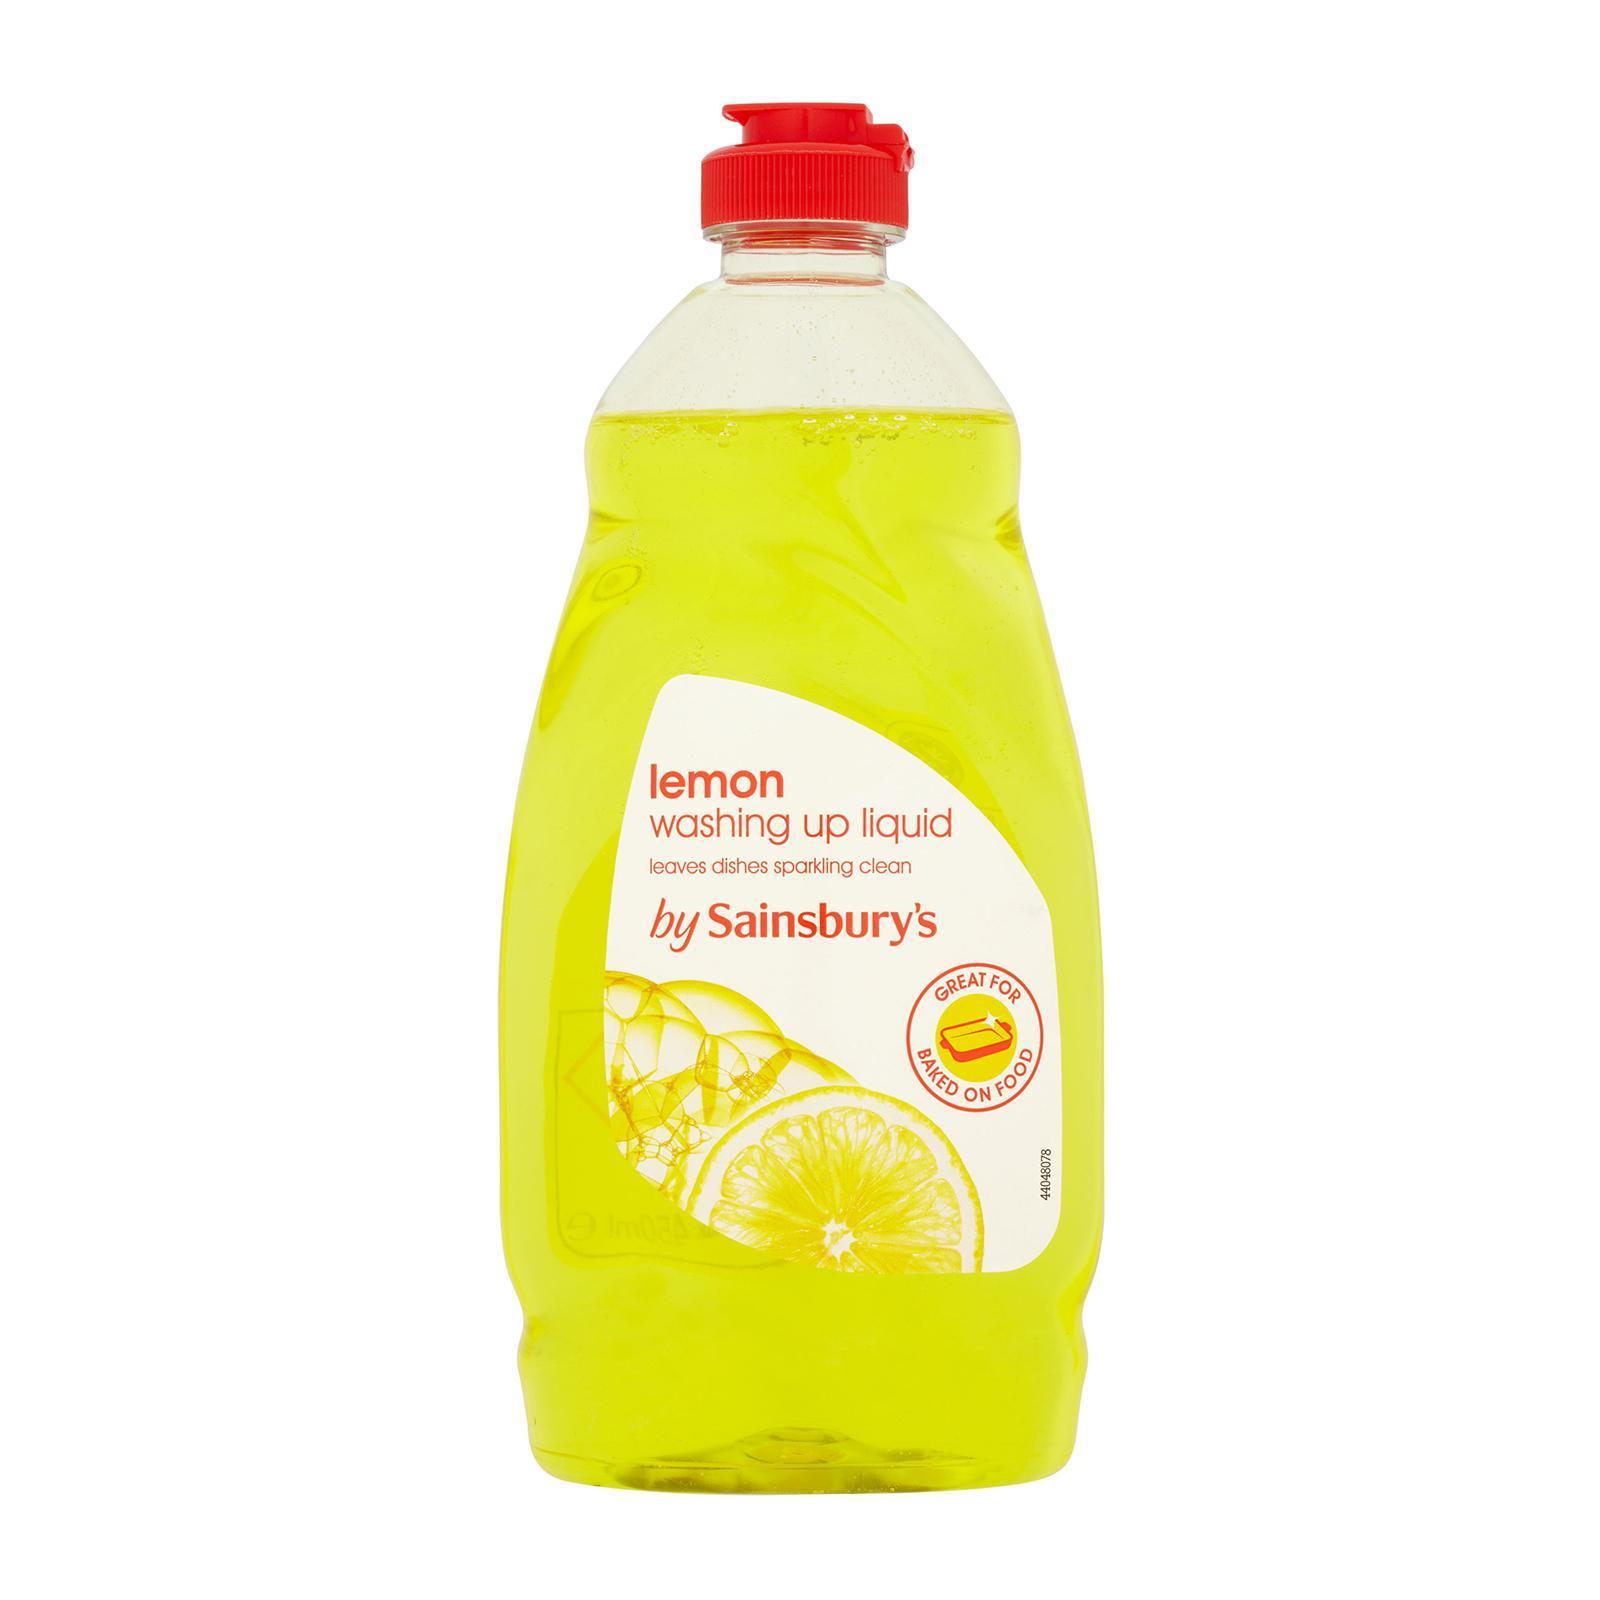 Sainsbury's Washing Up Liquid Lemon